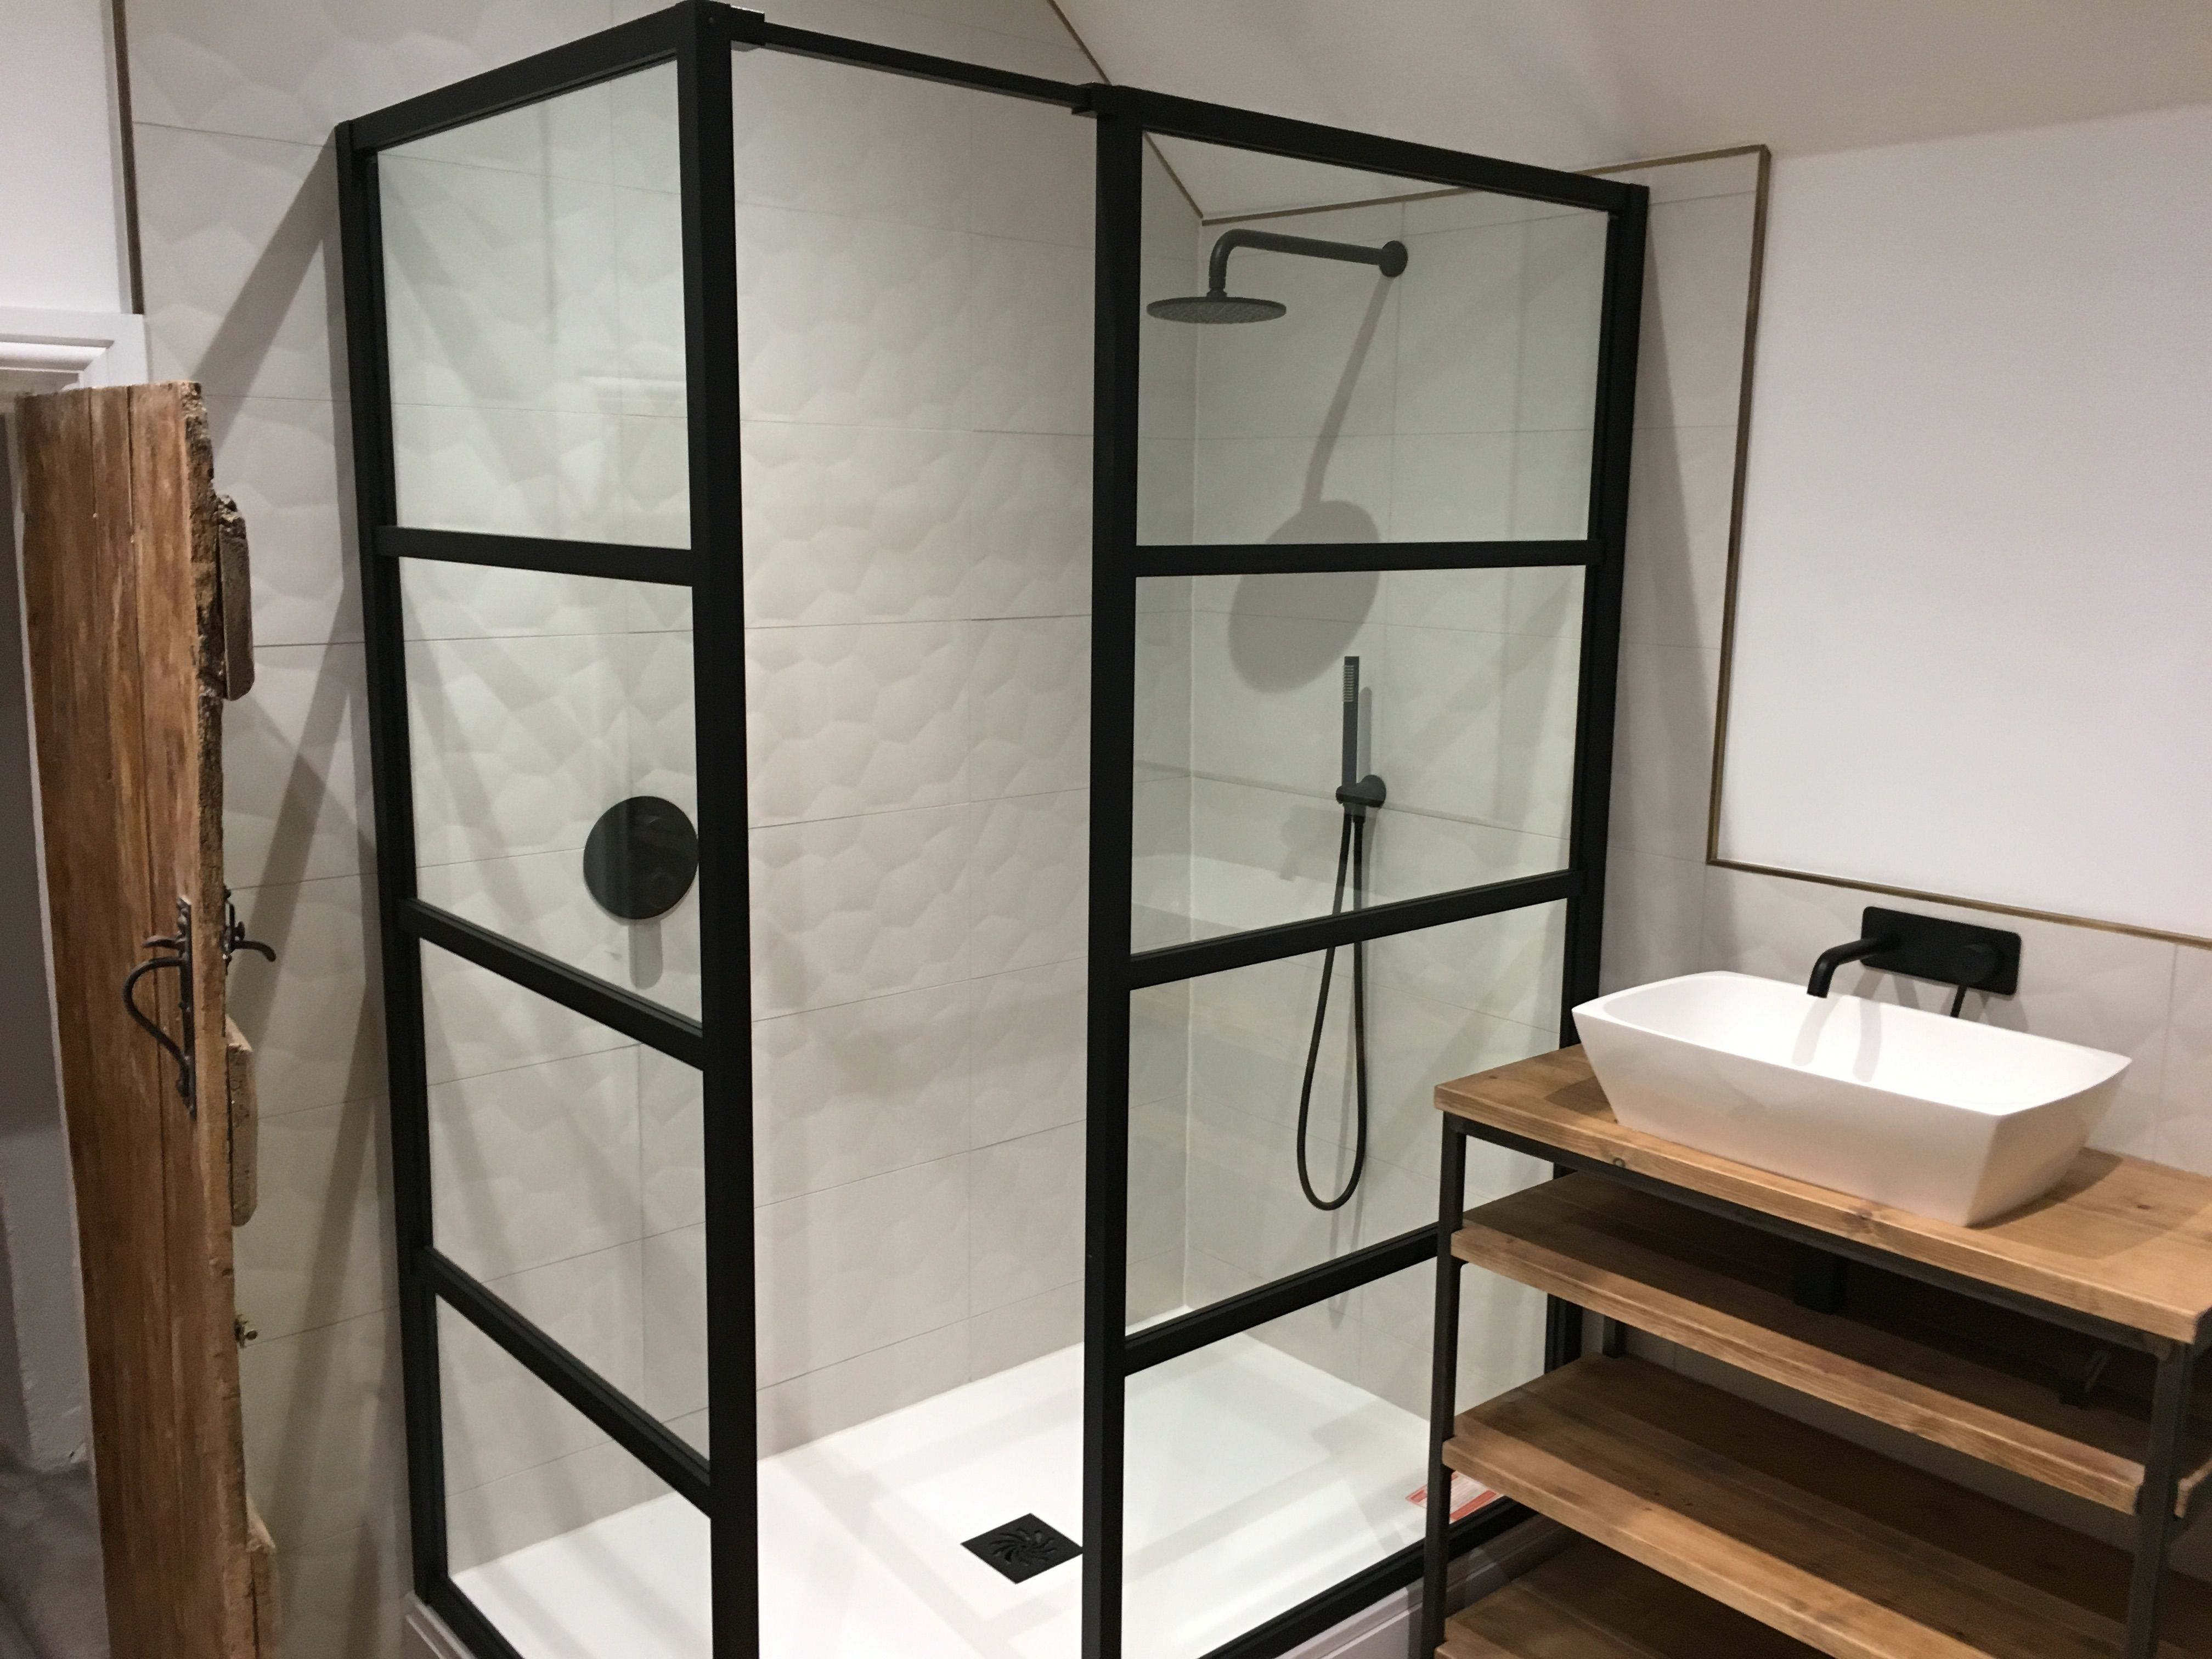 Industrial Style Bathroom Basin Vanity Unit Bathroom Styling Industrial Style Bathroom Bathroom Basin Cabinet